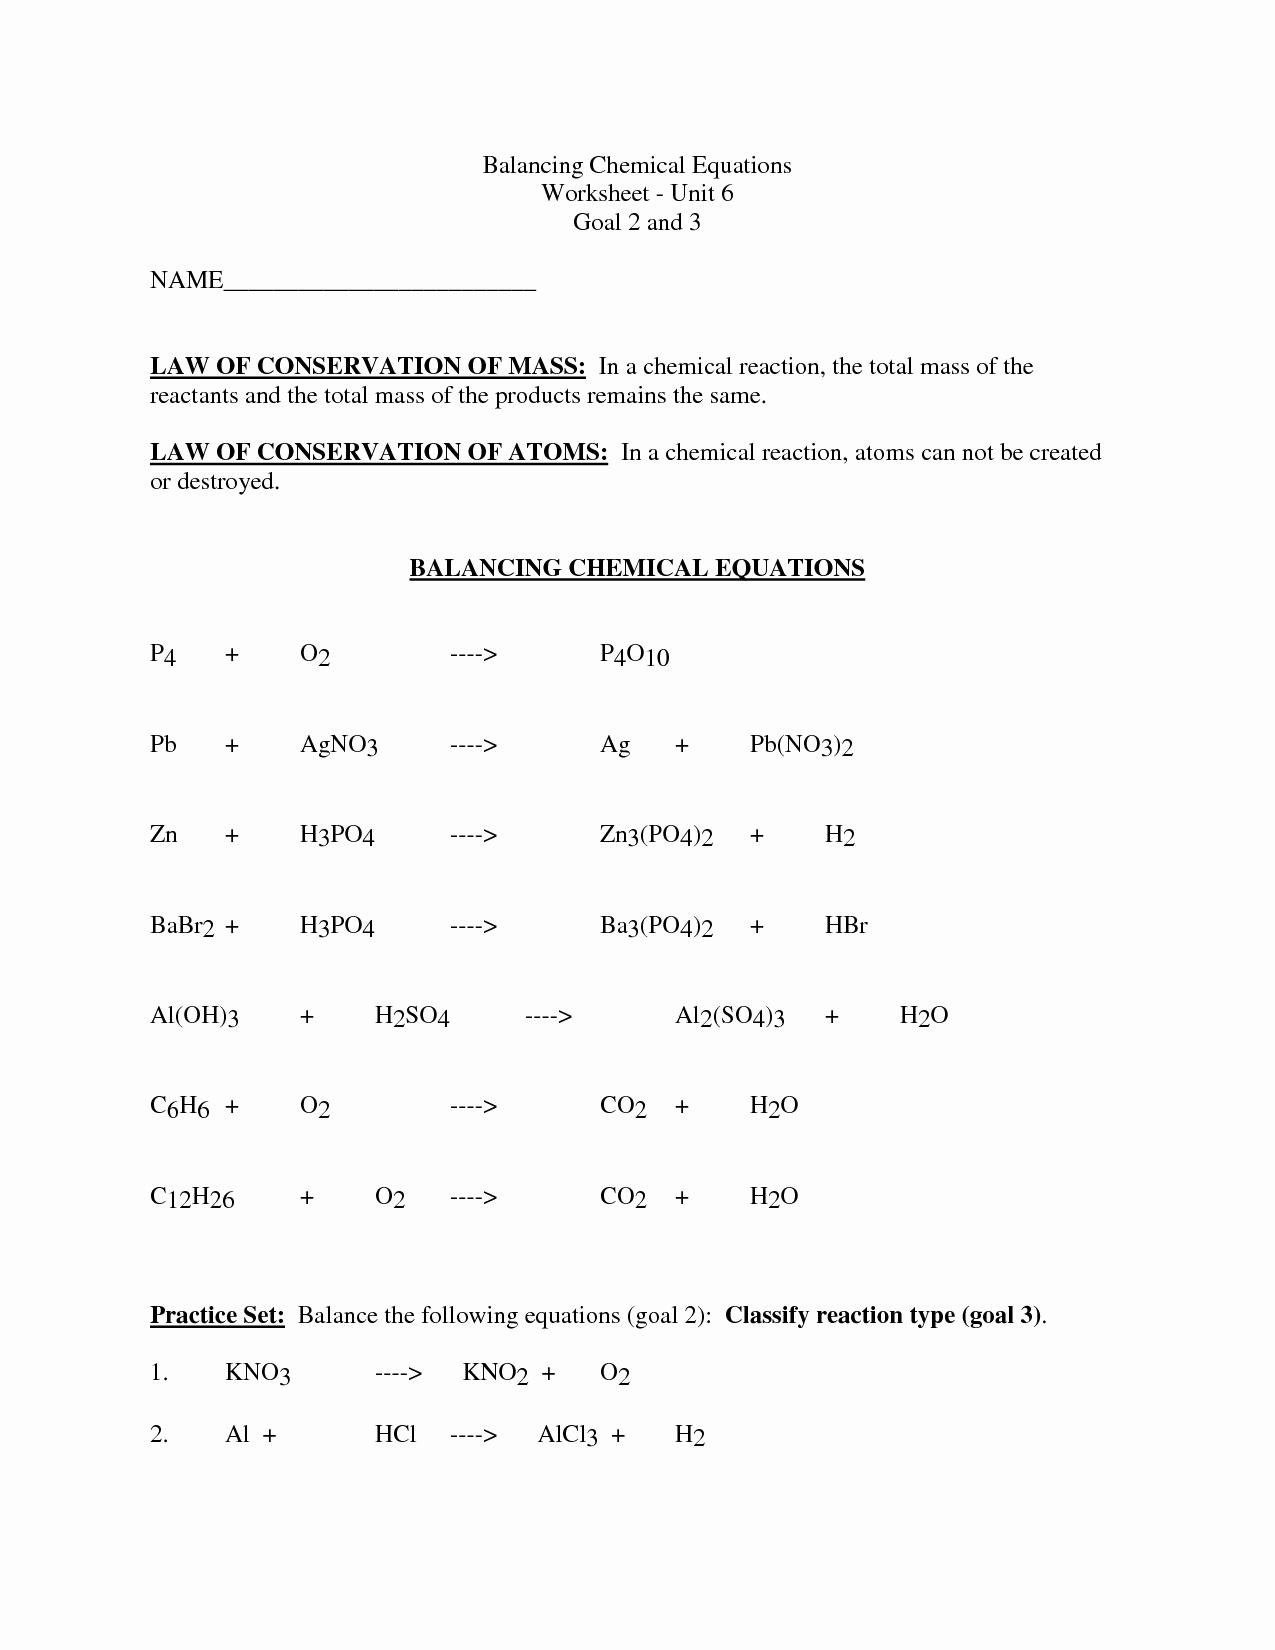 Balancing Chemical Equations Worksheet Answers Luxury 12 Best Of Balancing Chemical Equations Worksheet